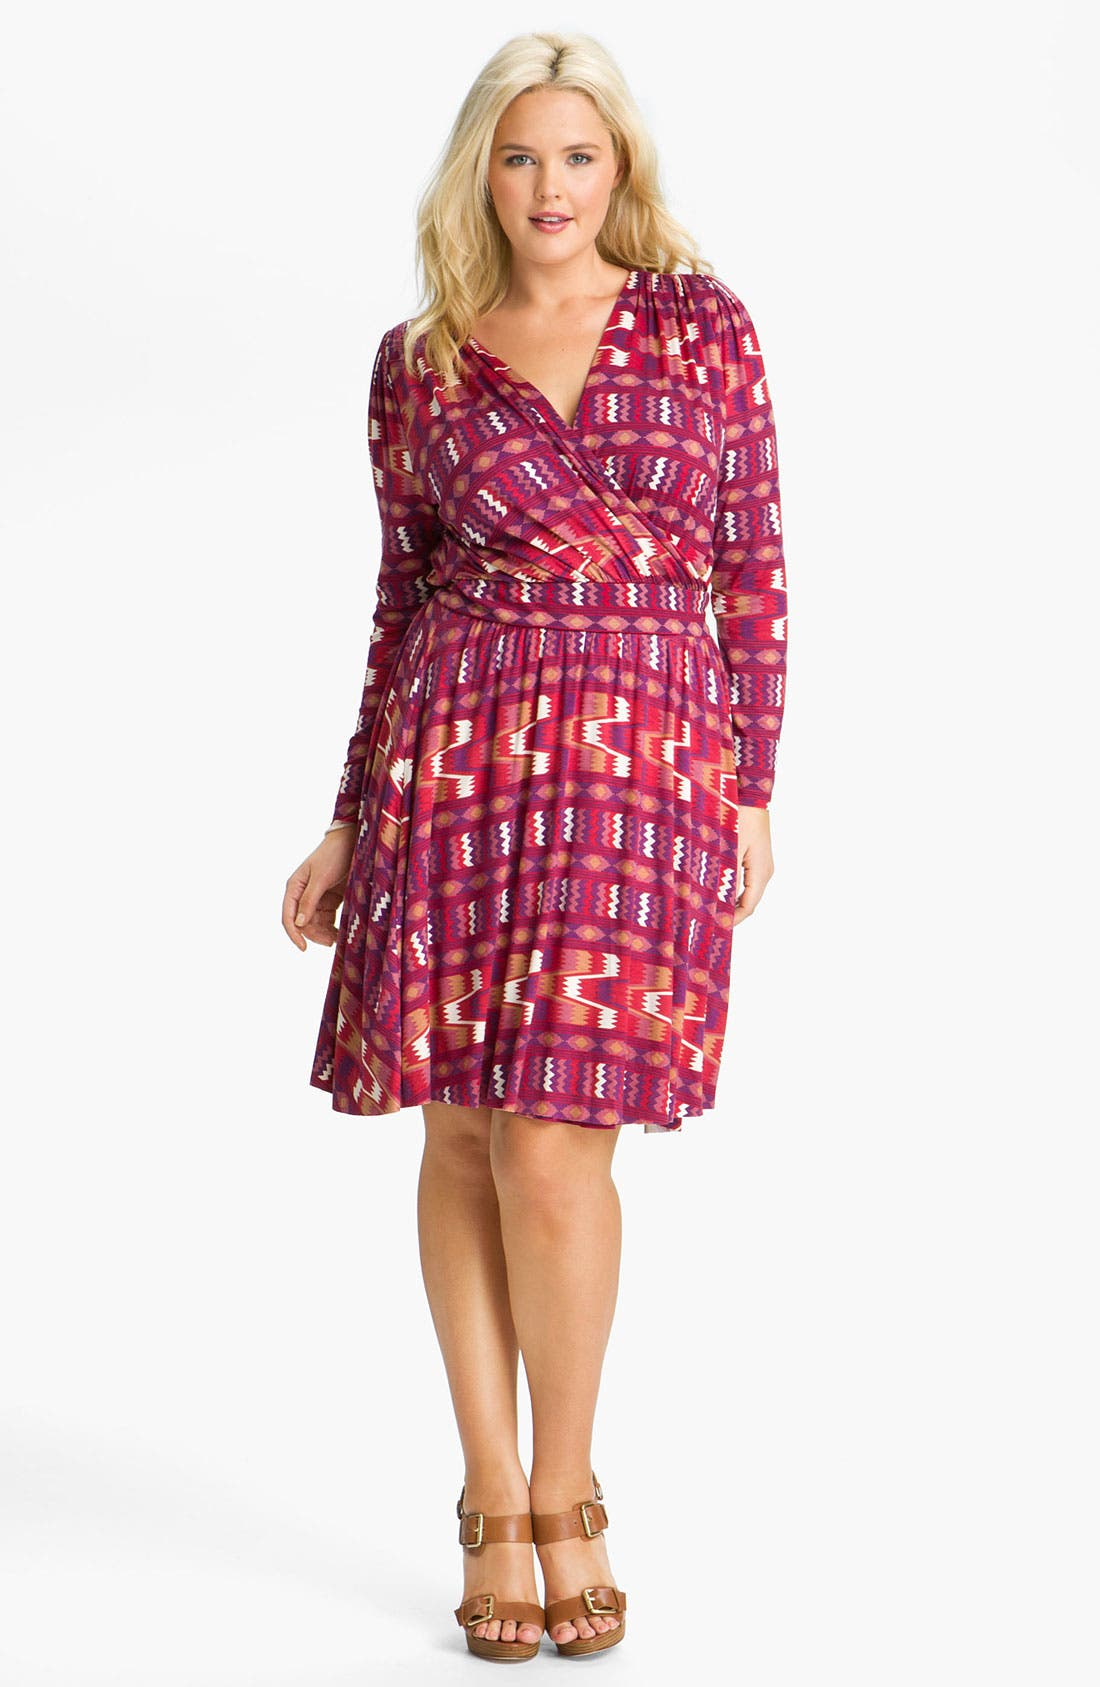 Alternate Image 1 Selected - Rachel Pally 'Rocio' Print Wrap Dress (Plus)